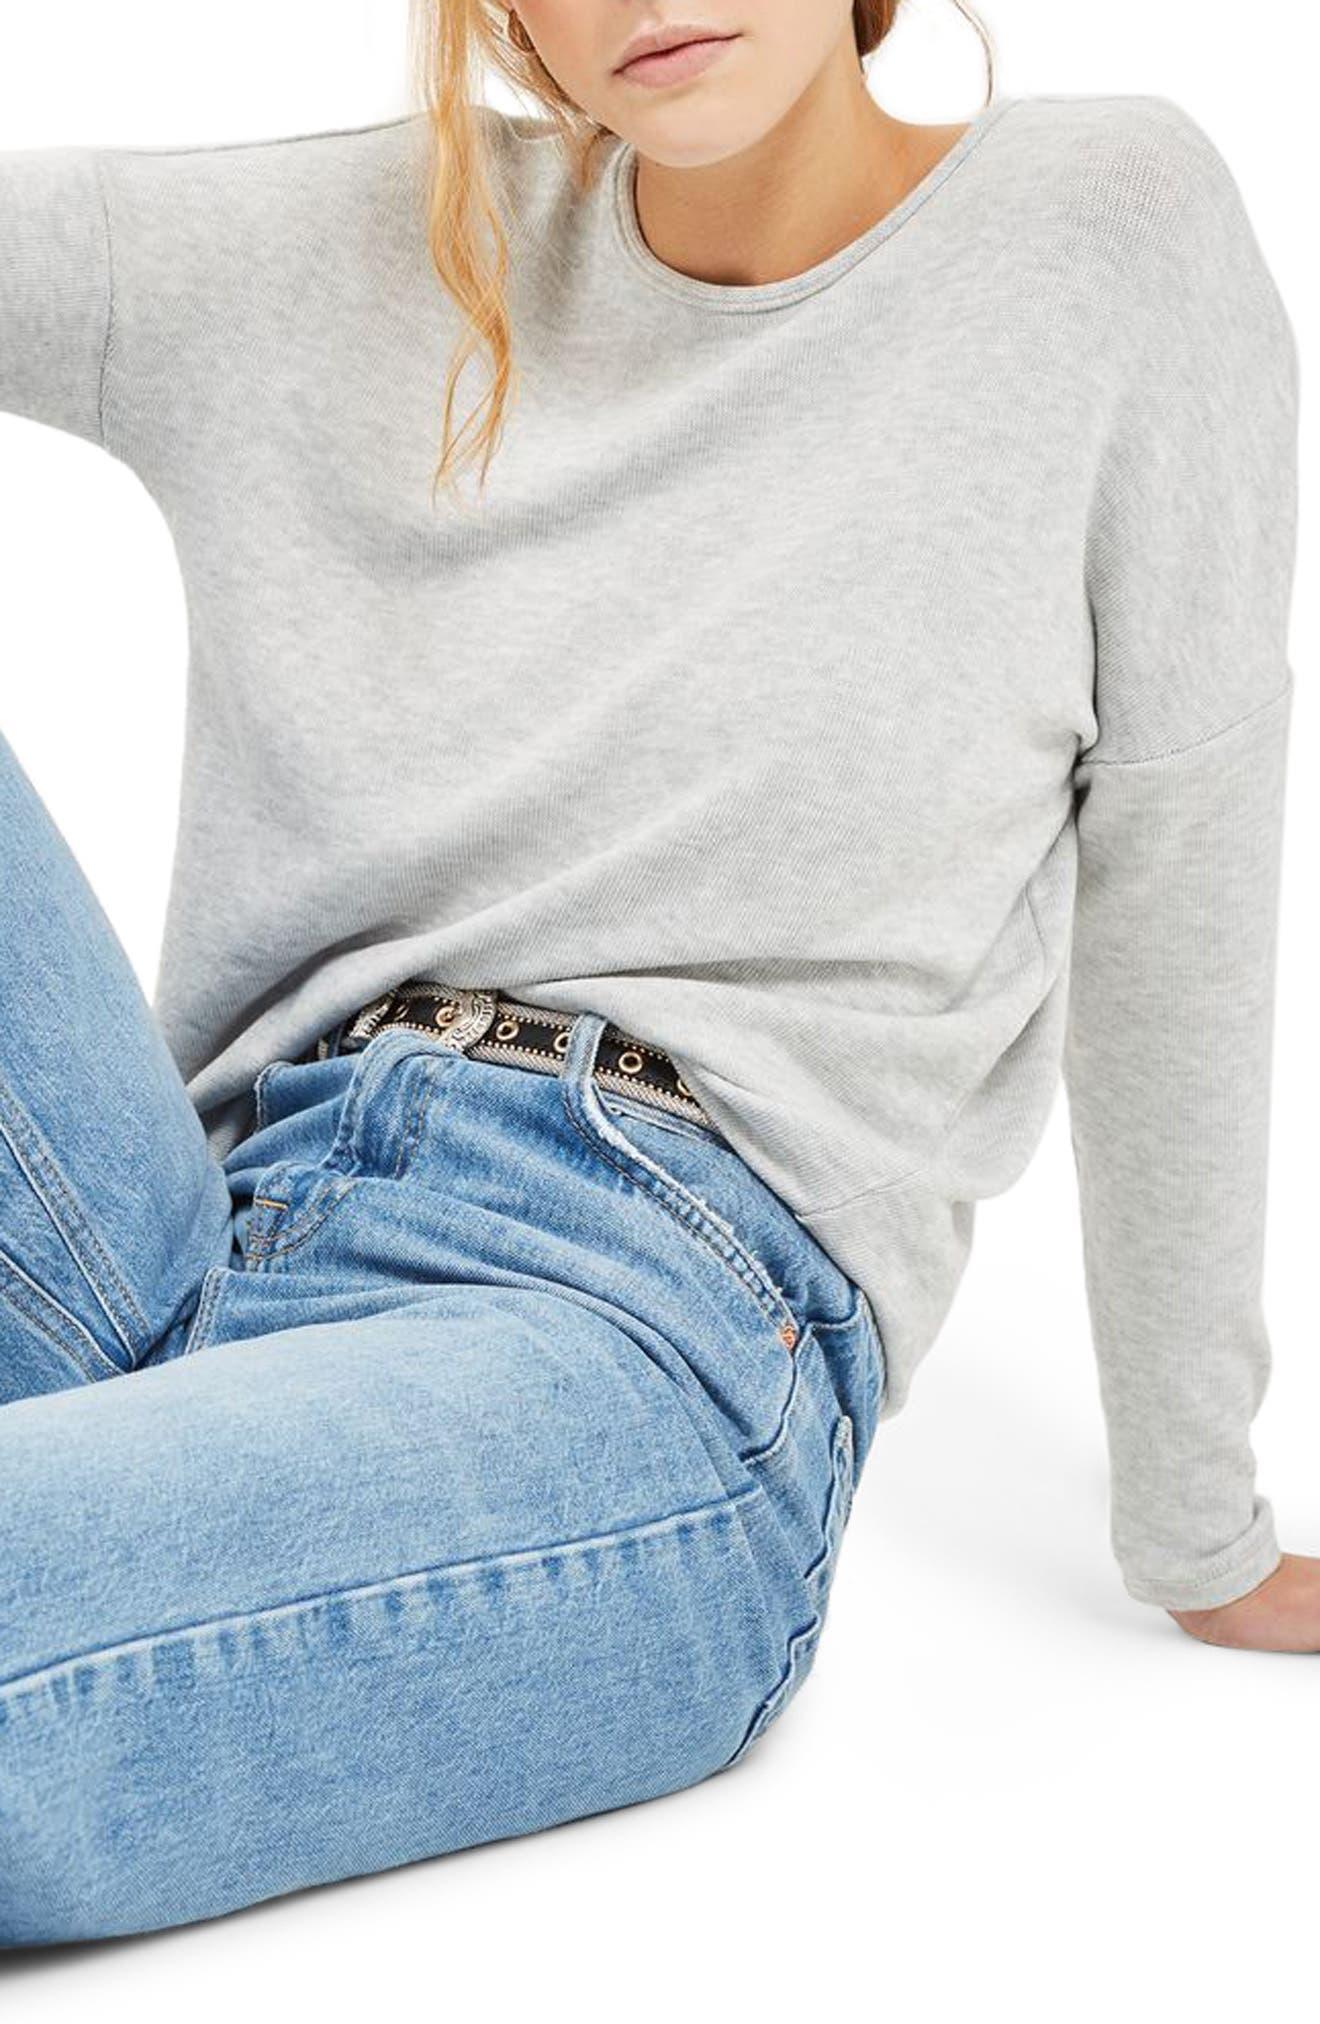 Topshop Tie Back Sweater